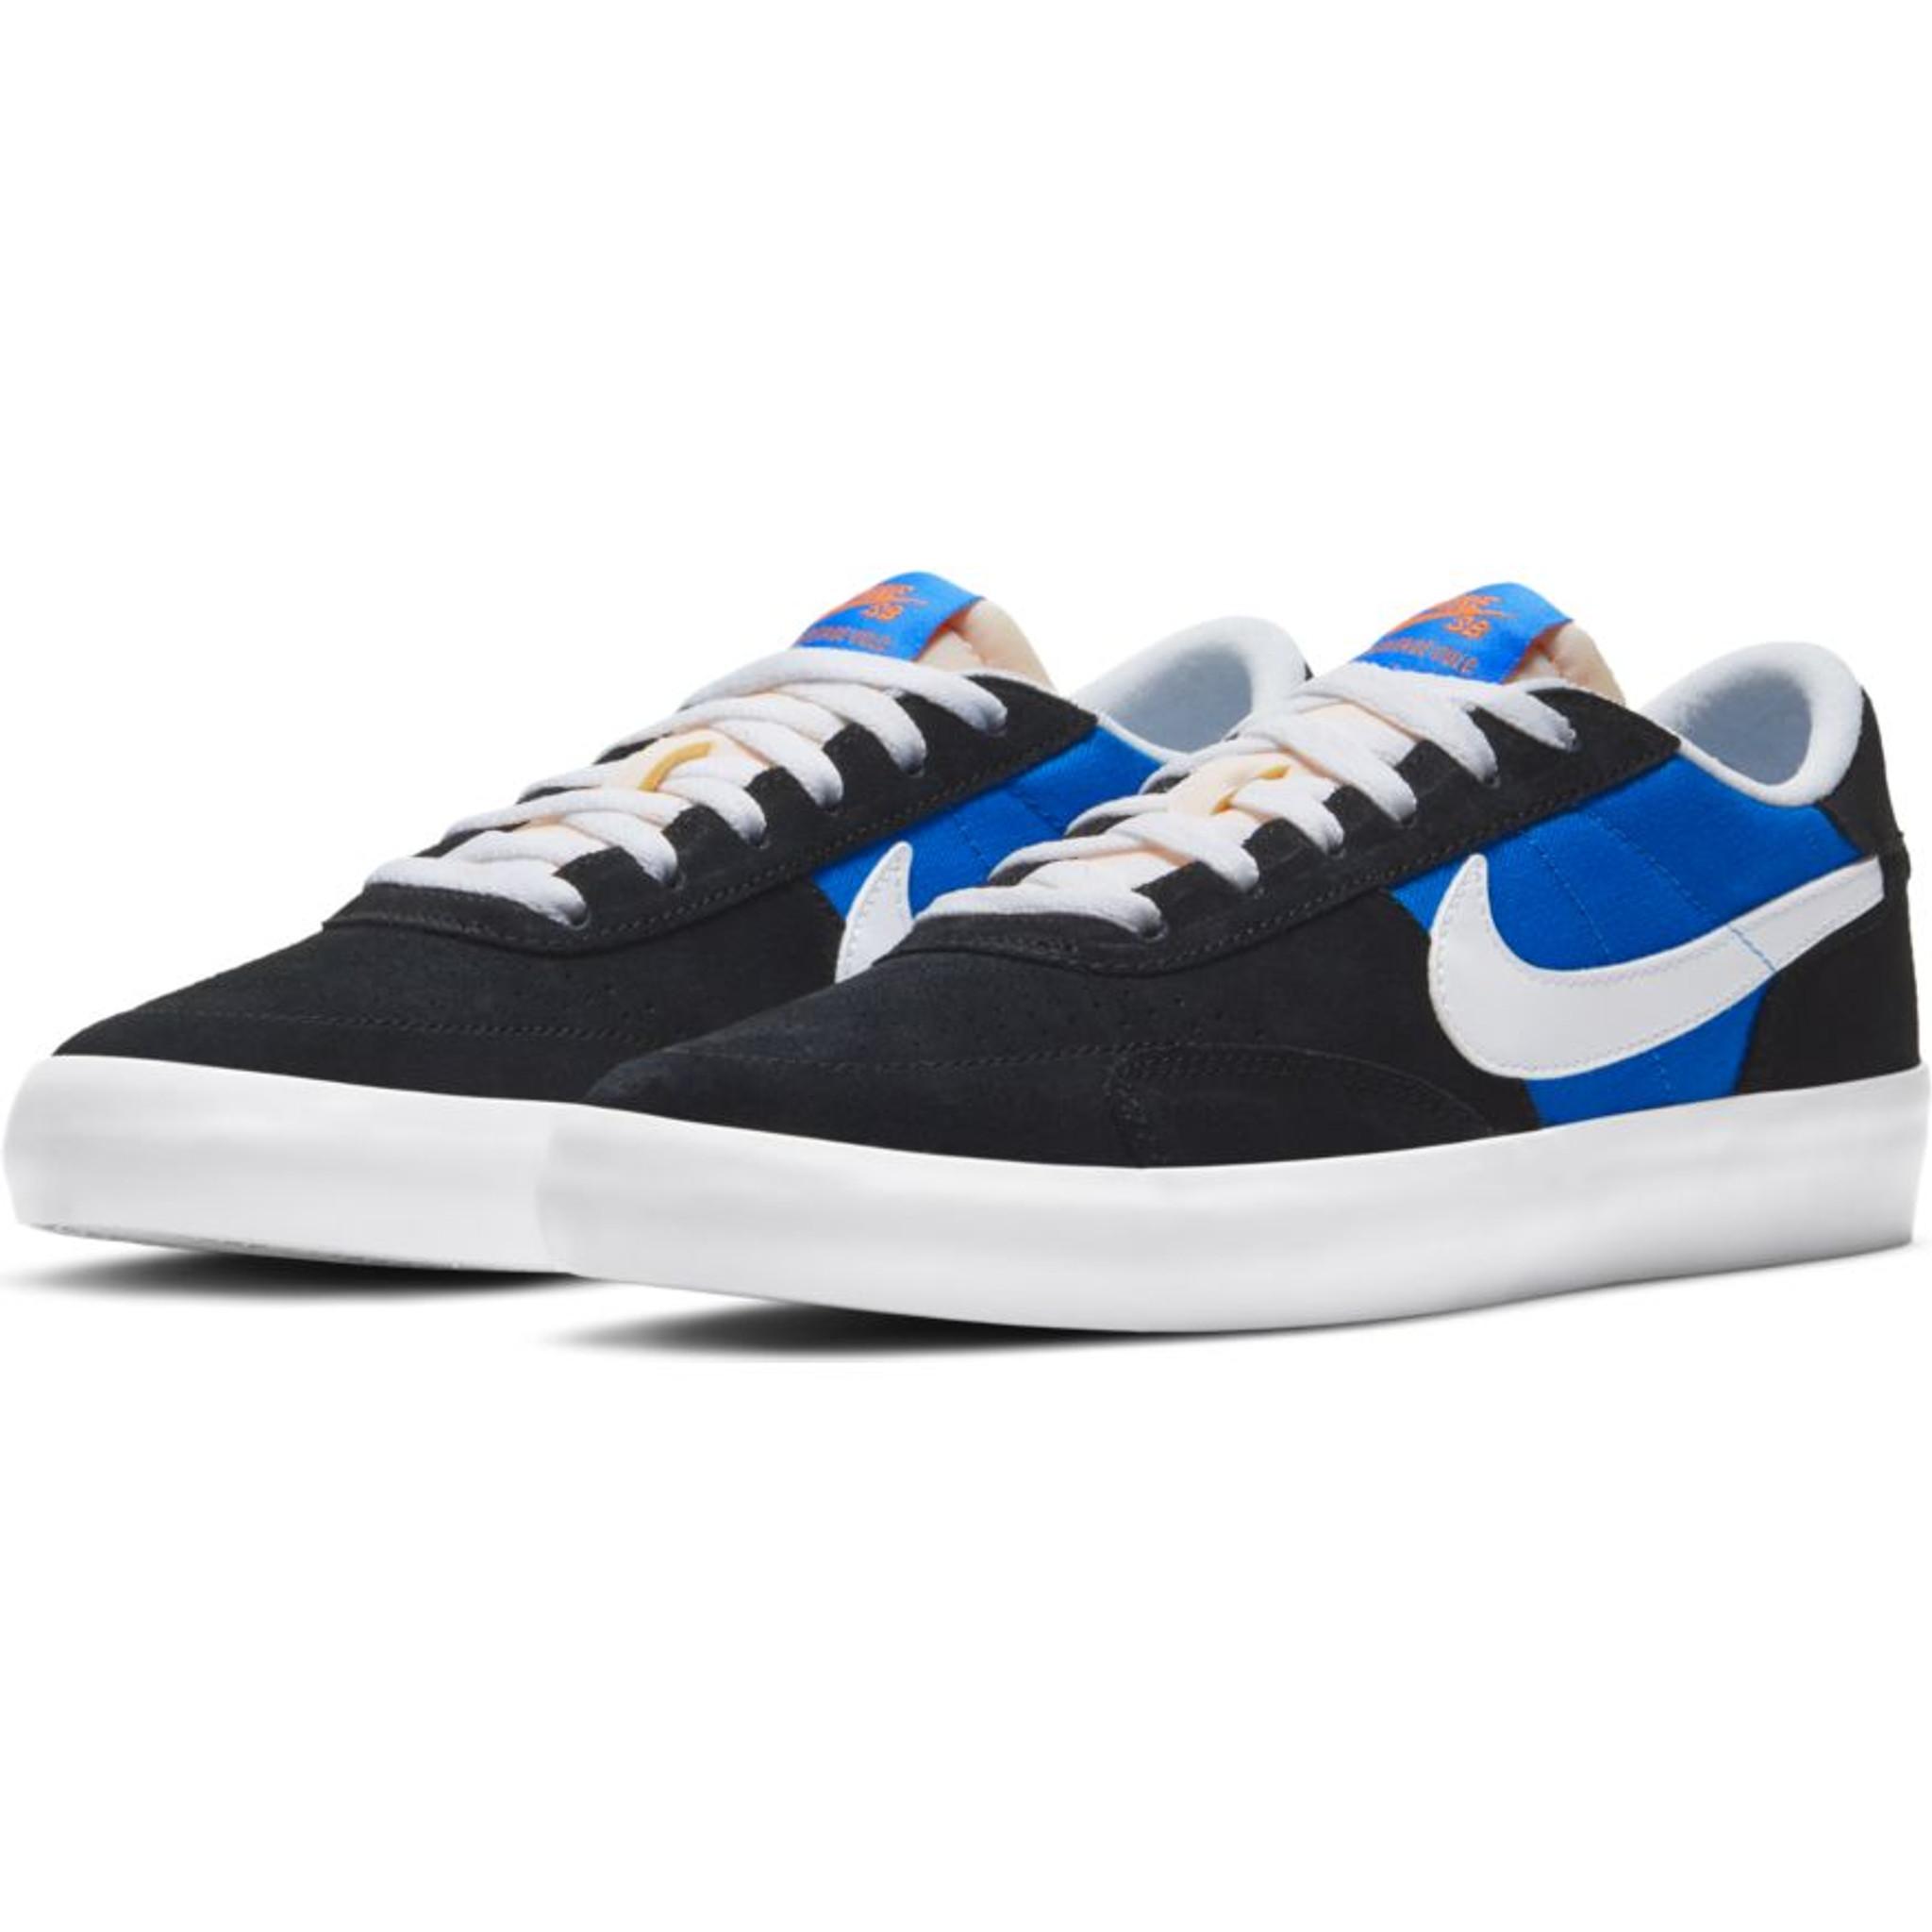 Nike SB Heritage Vulc Shoes (Black/Signal Blue) FREE USA SHIPPING